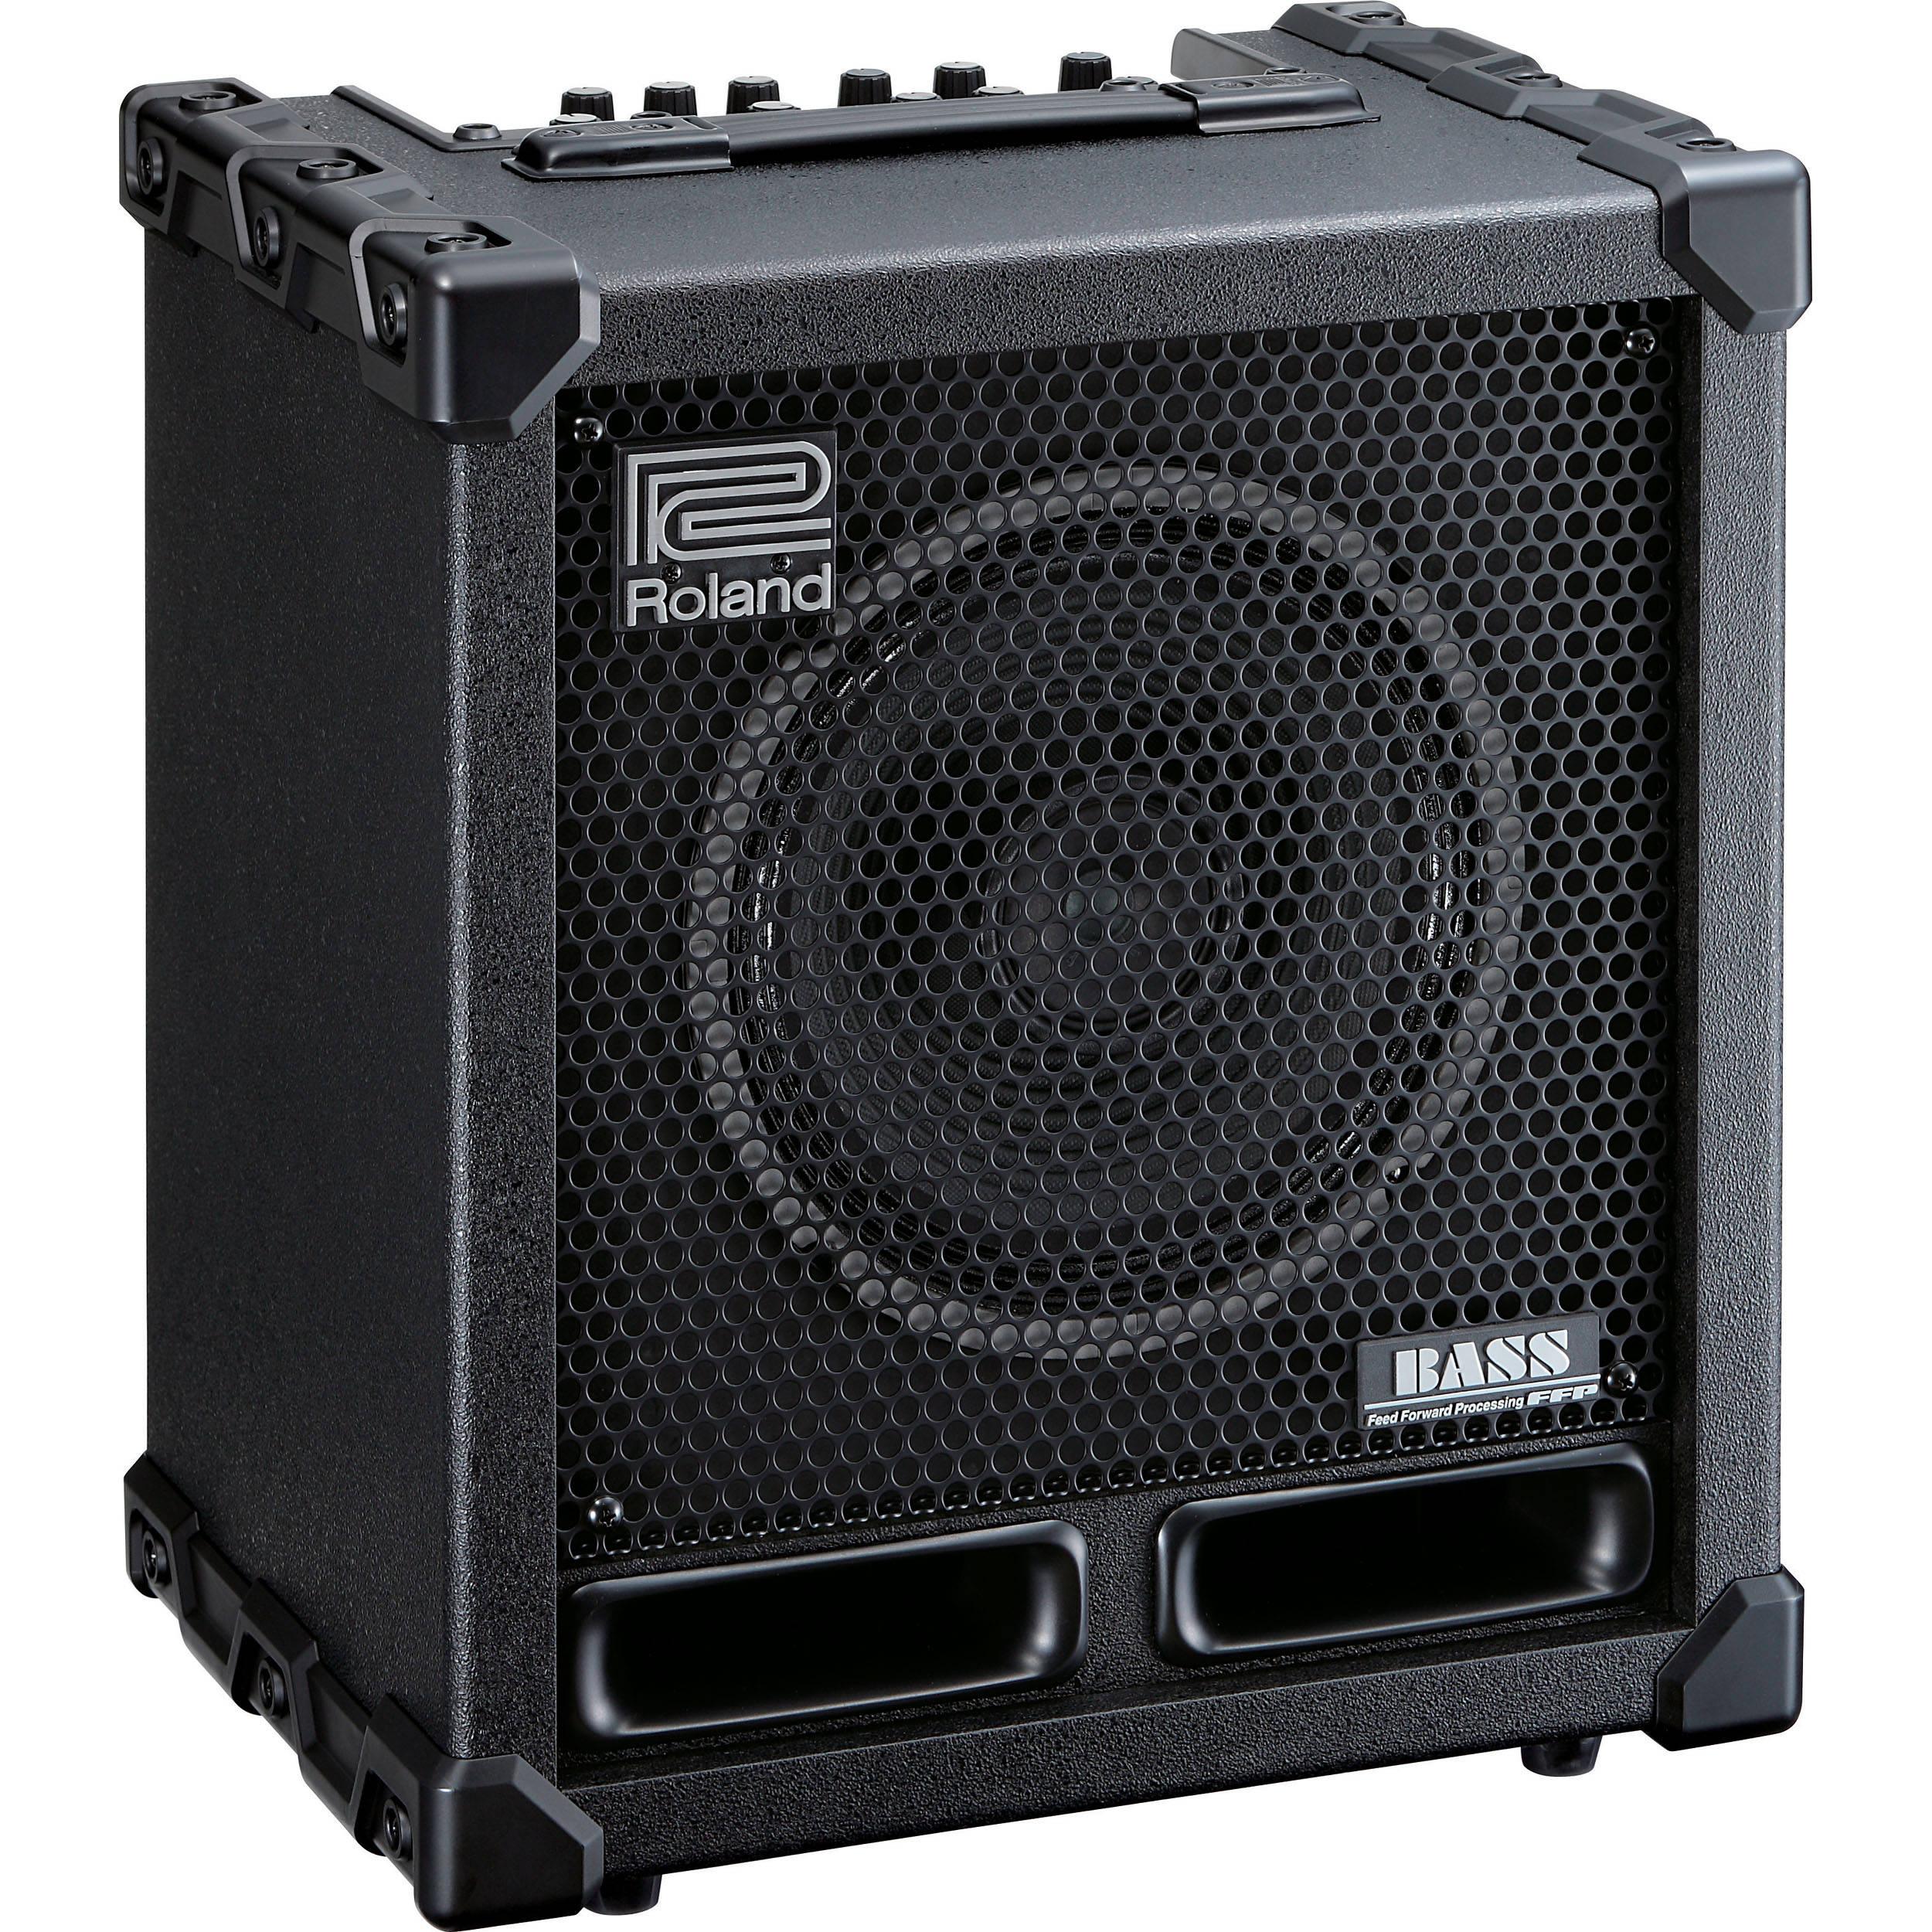 roland cube 60xl bass compact bass amplifier speaker cb 60xl. Black Bedroom Furniture Sets. Home Design Ideas